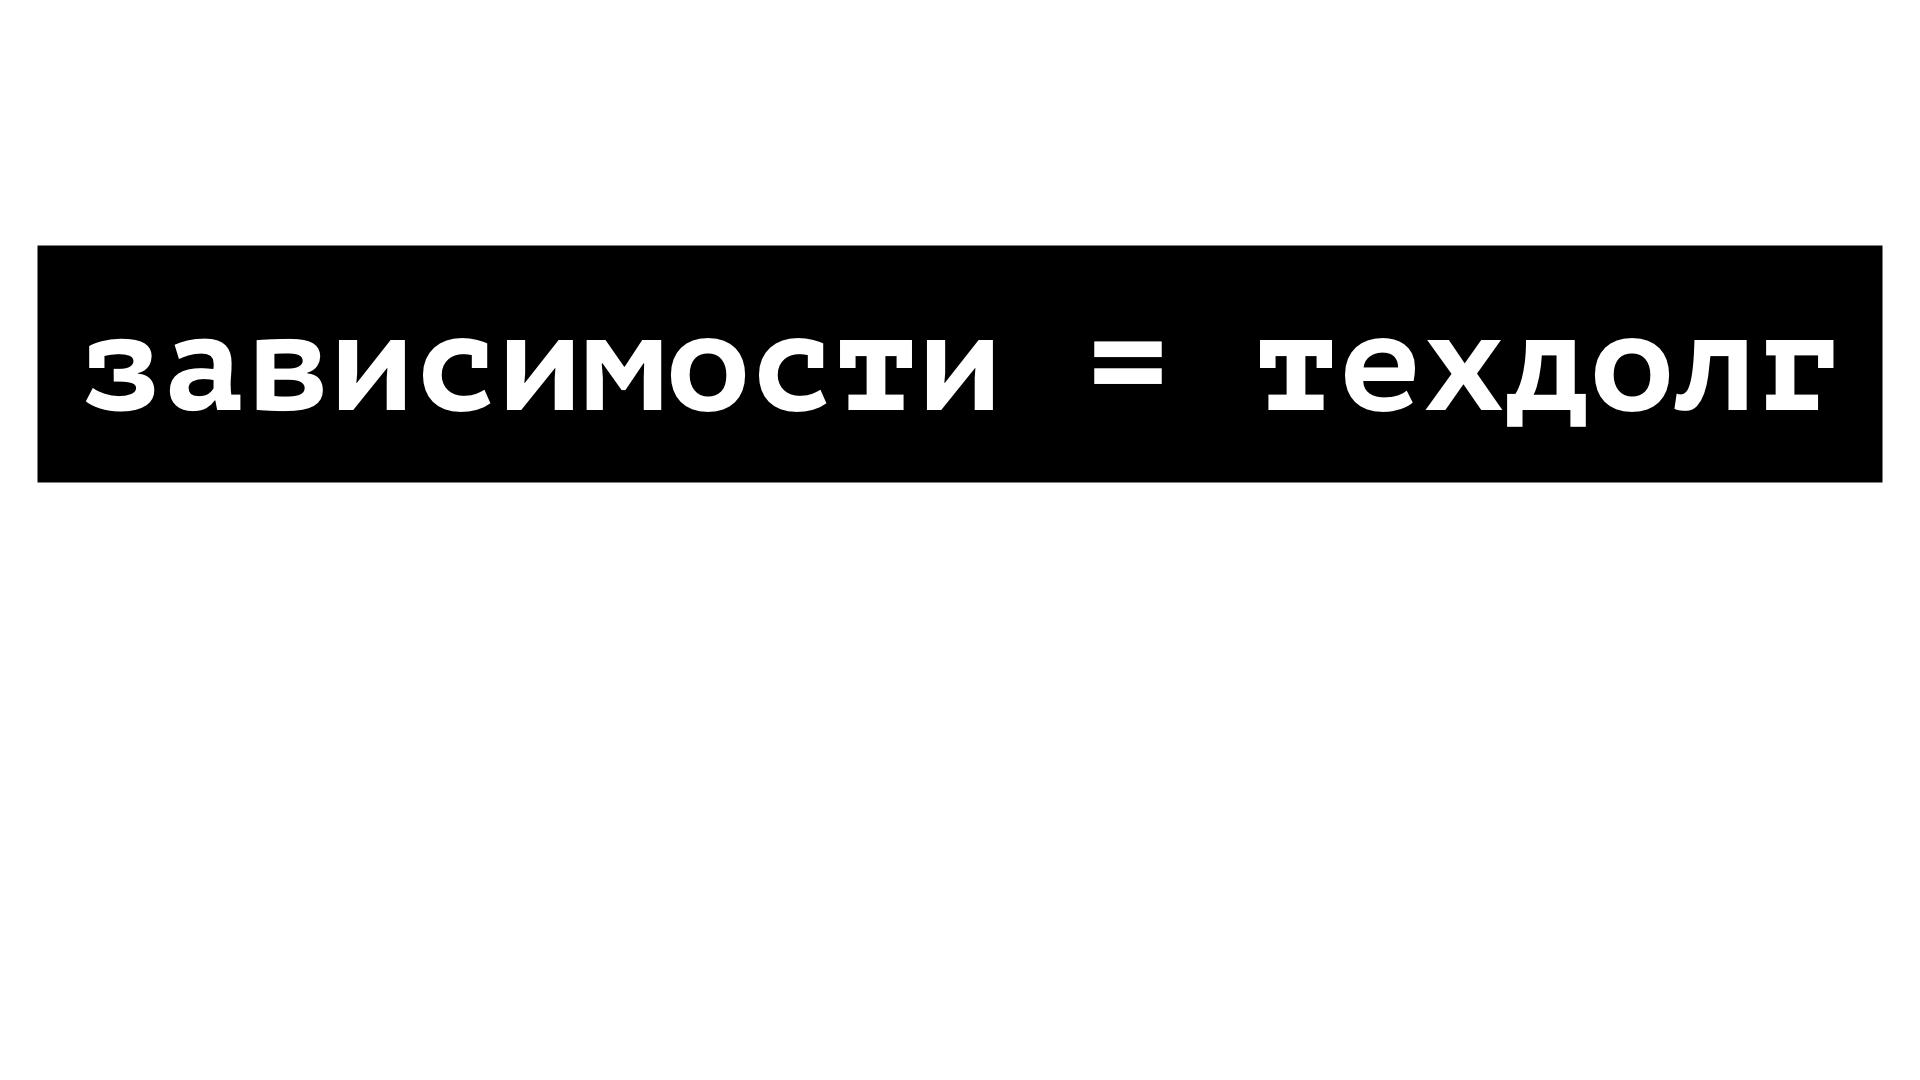 зависимости = техдолг